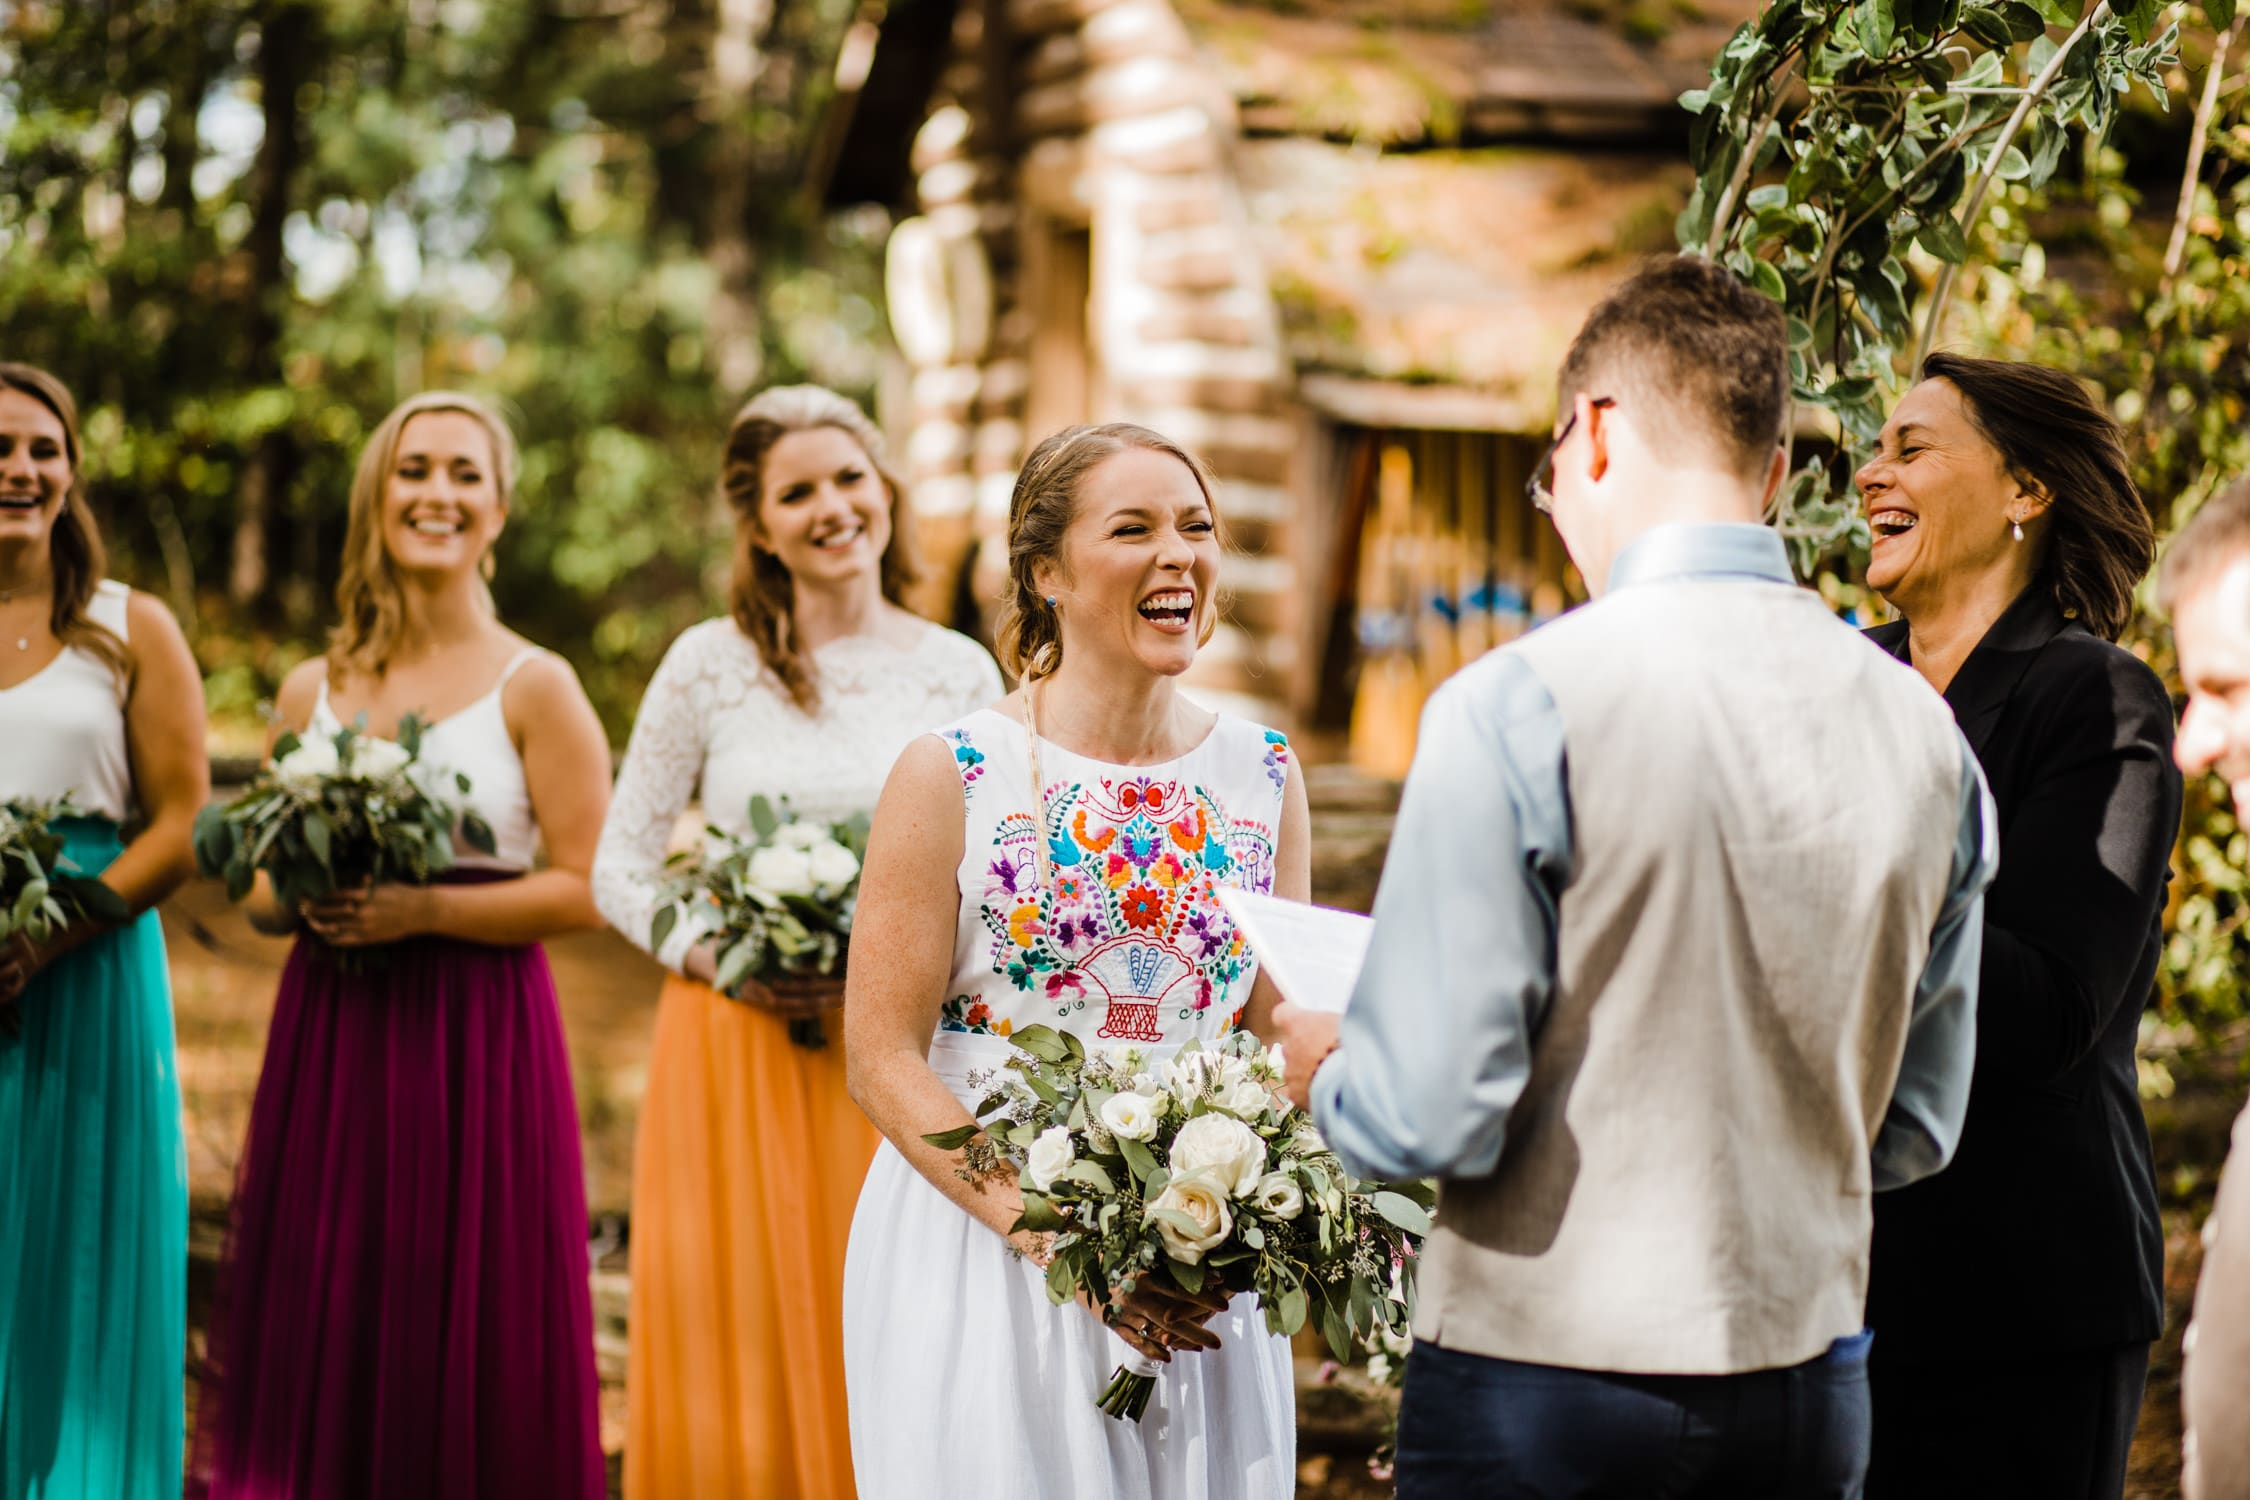 Carley-Teresa-Photography-Wedding-Photographer-2